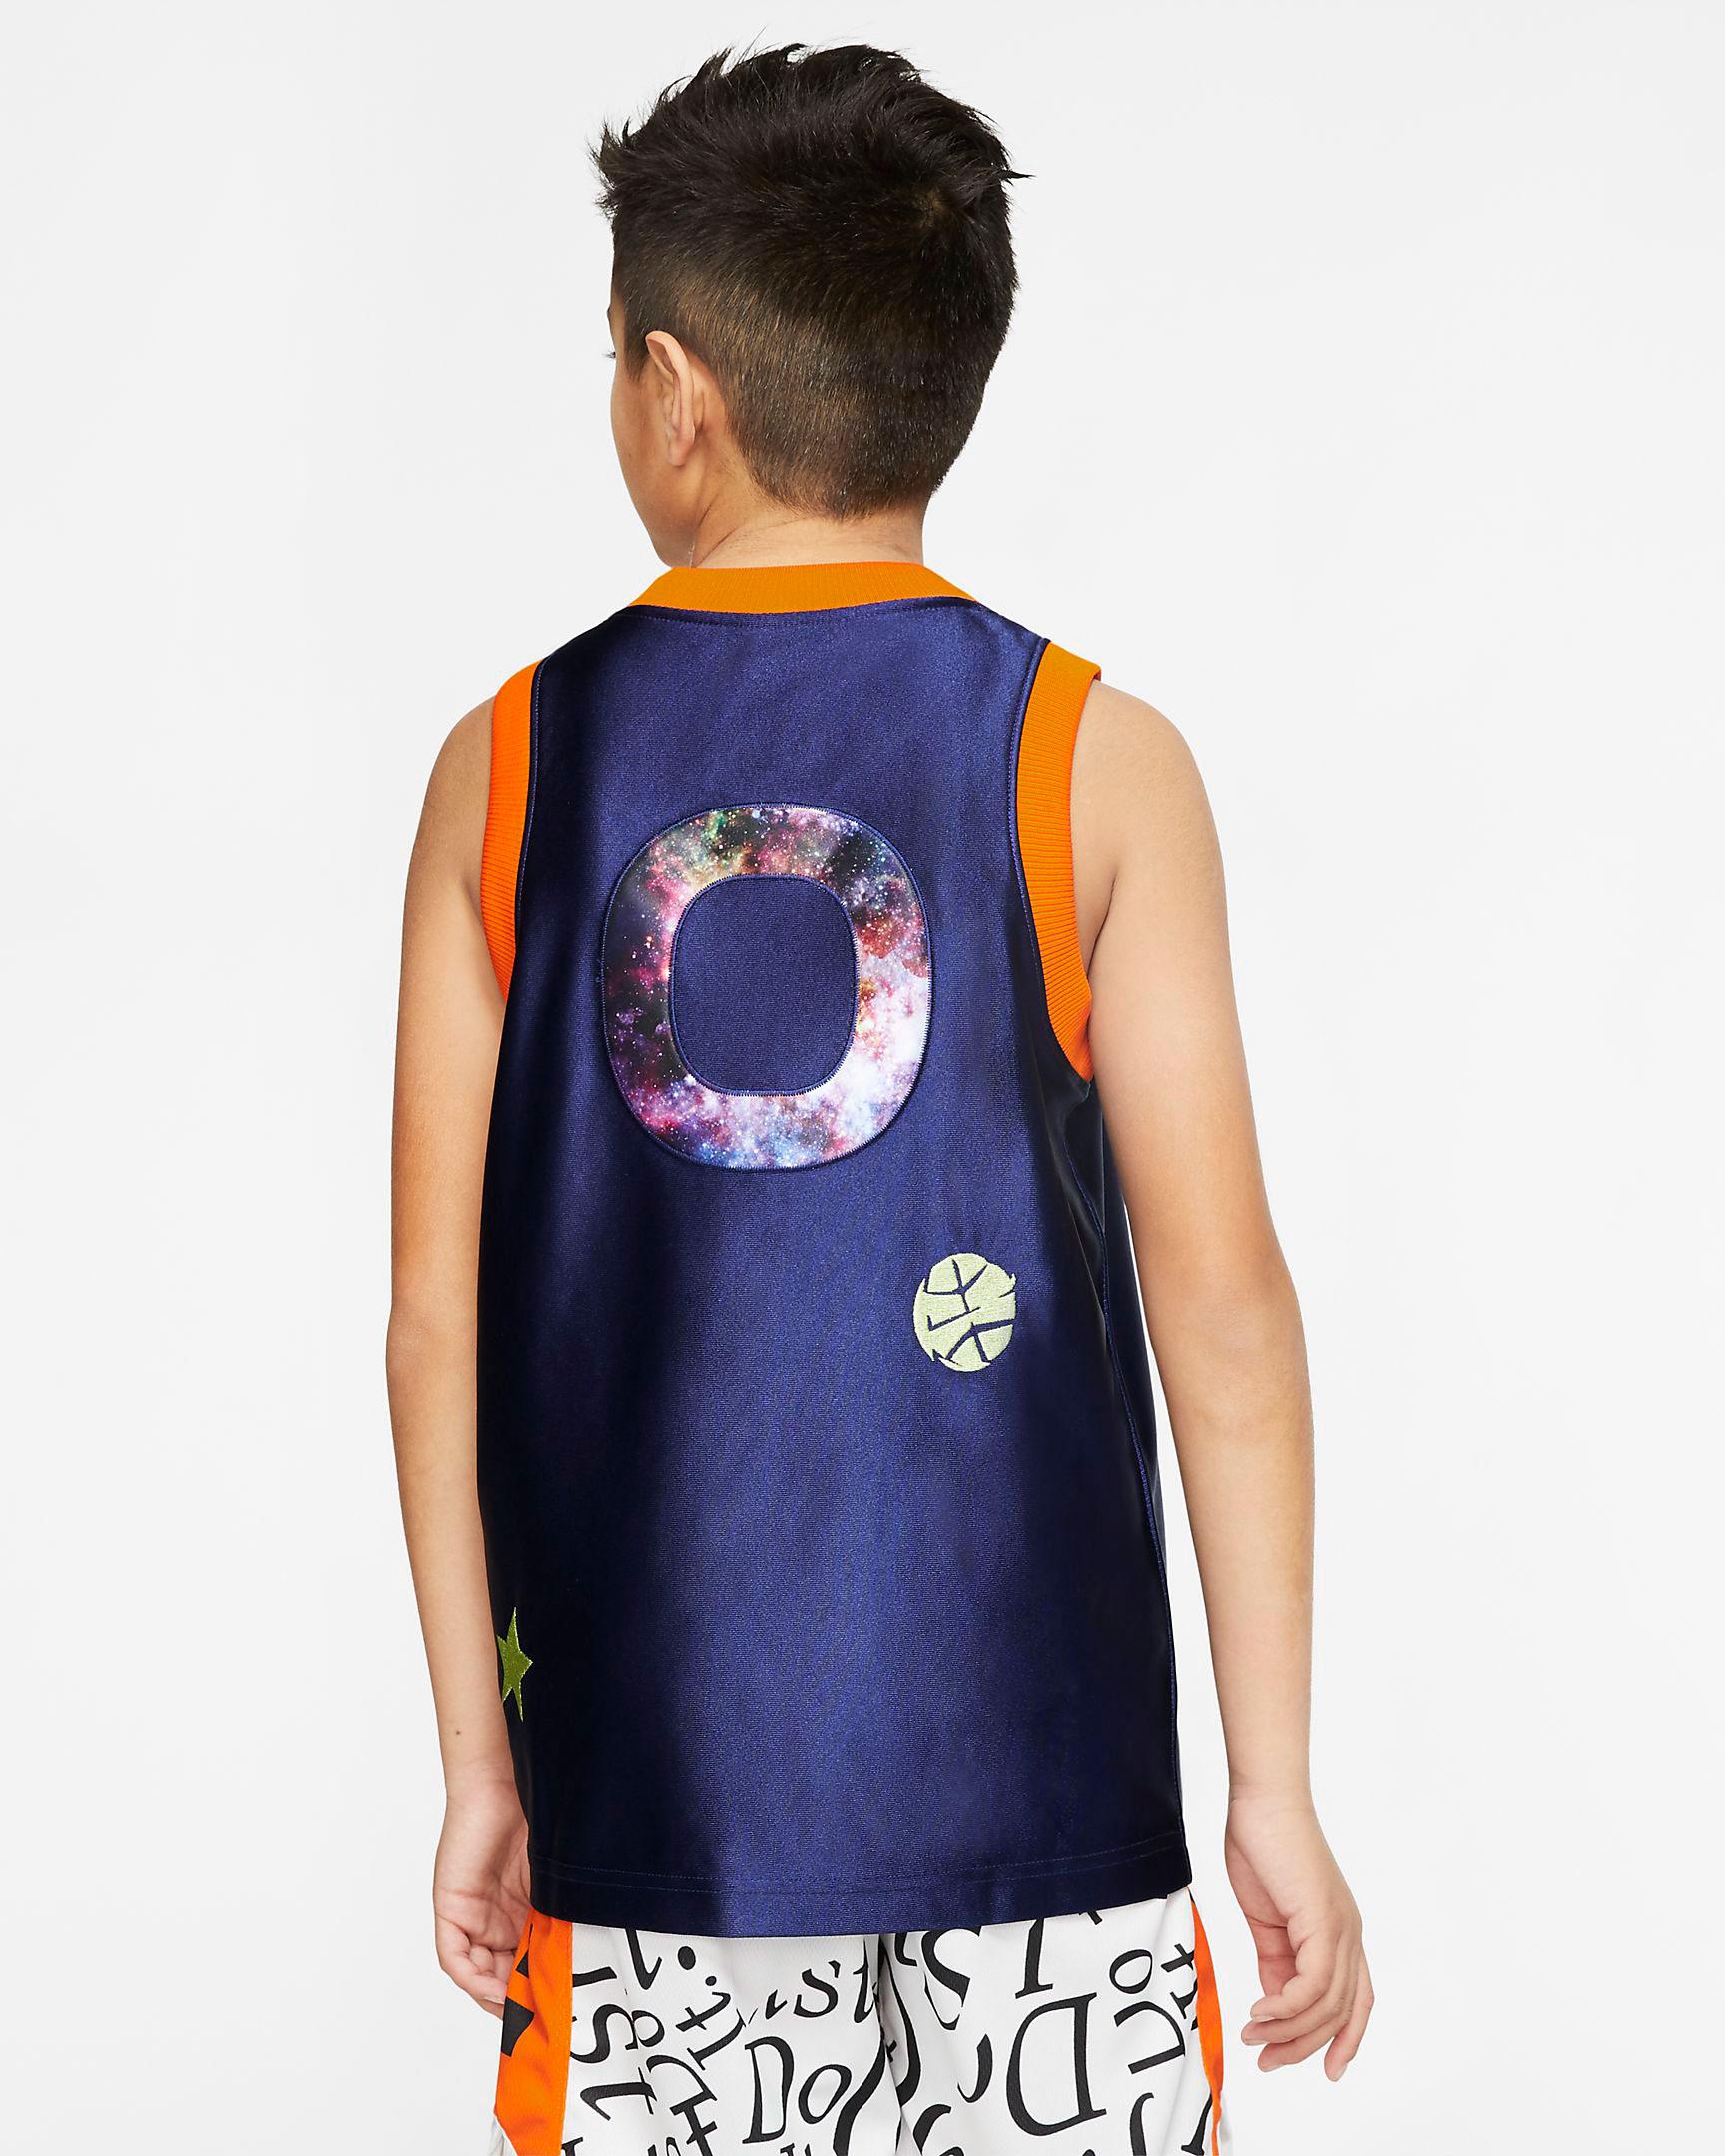 nike-lebron-monstars-kids-jersey-2